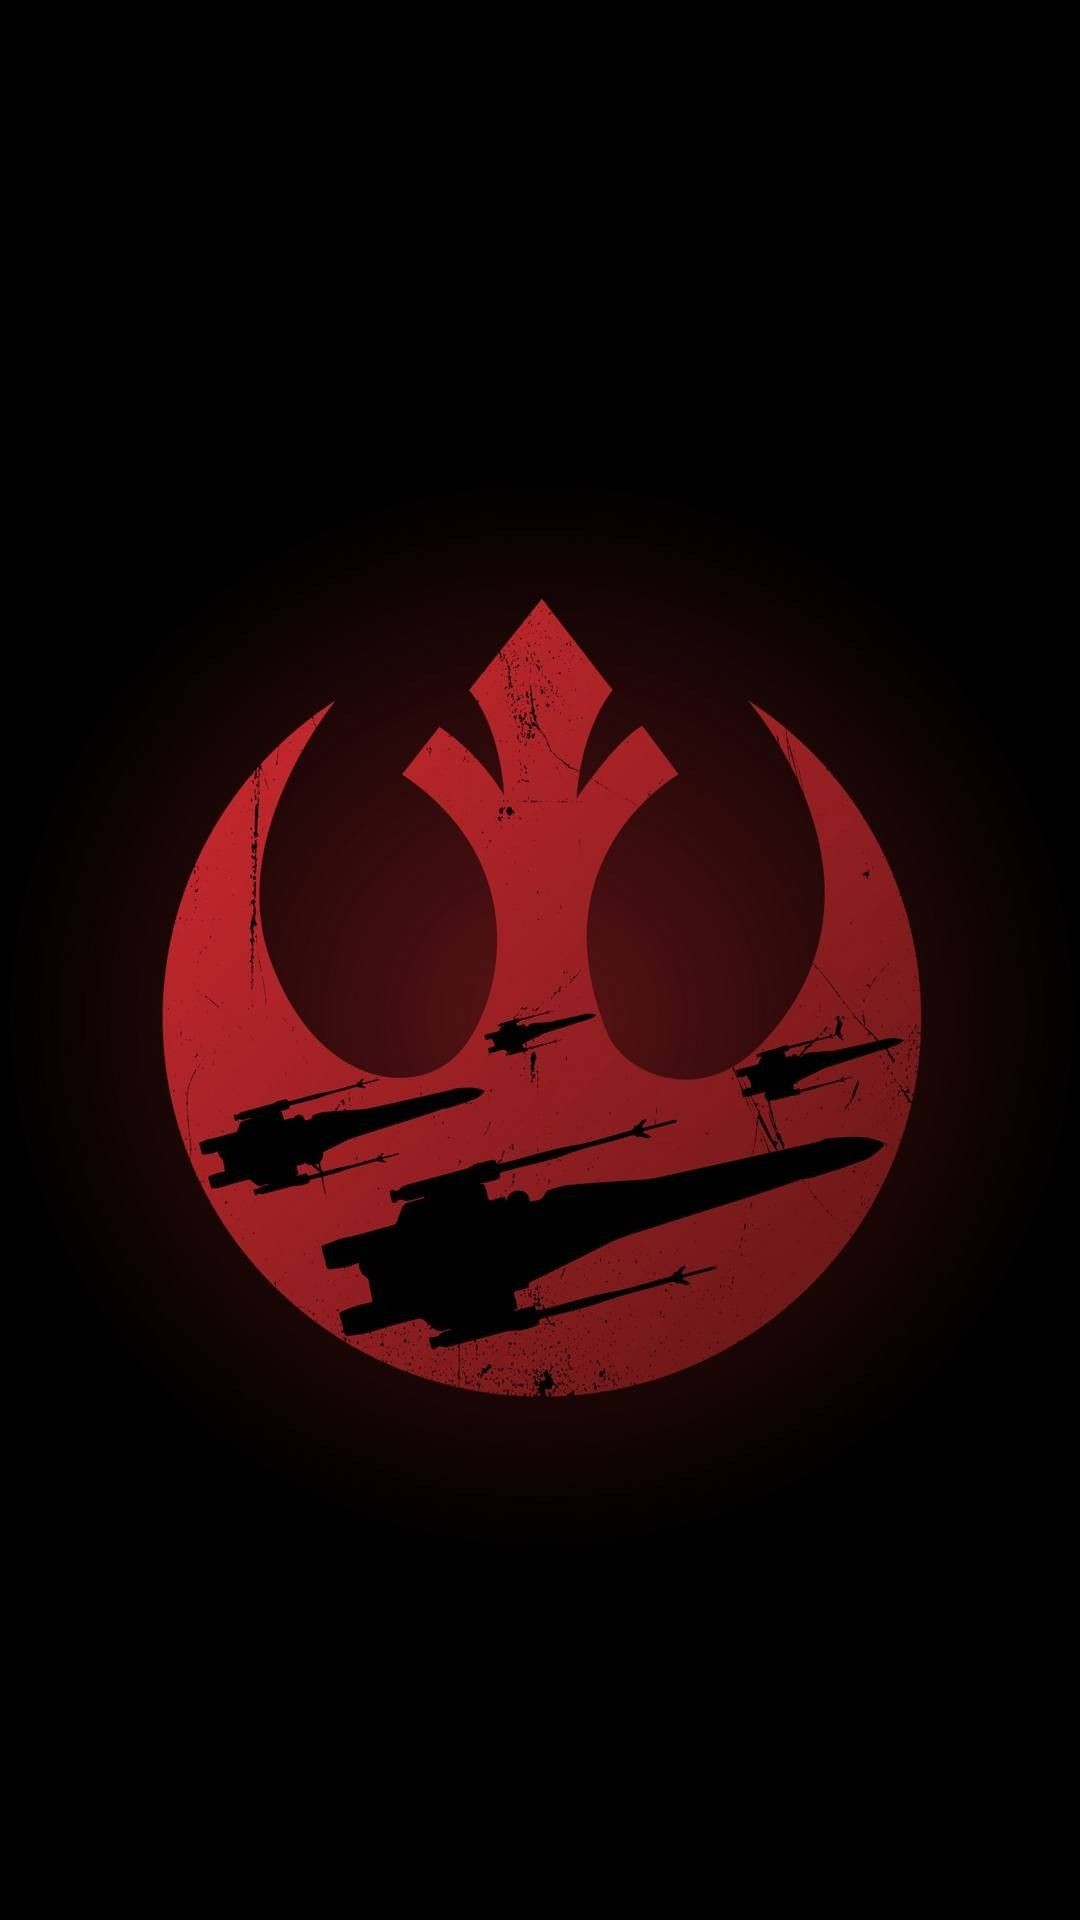 Star Wars Wallpaper Iphone Posted By John Mercado